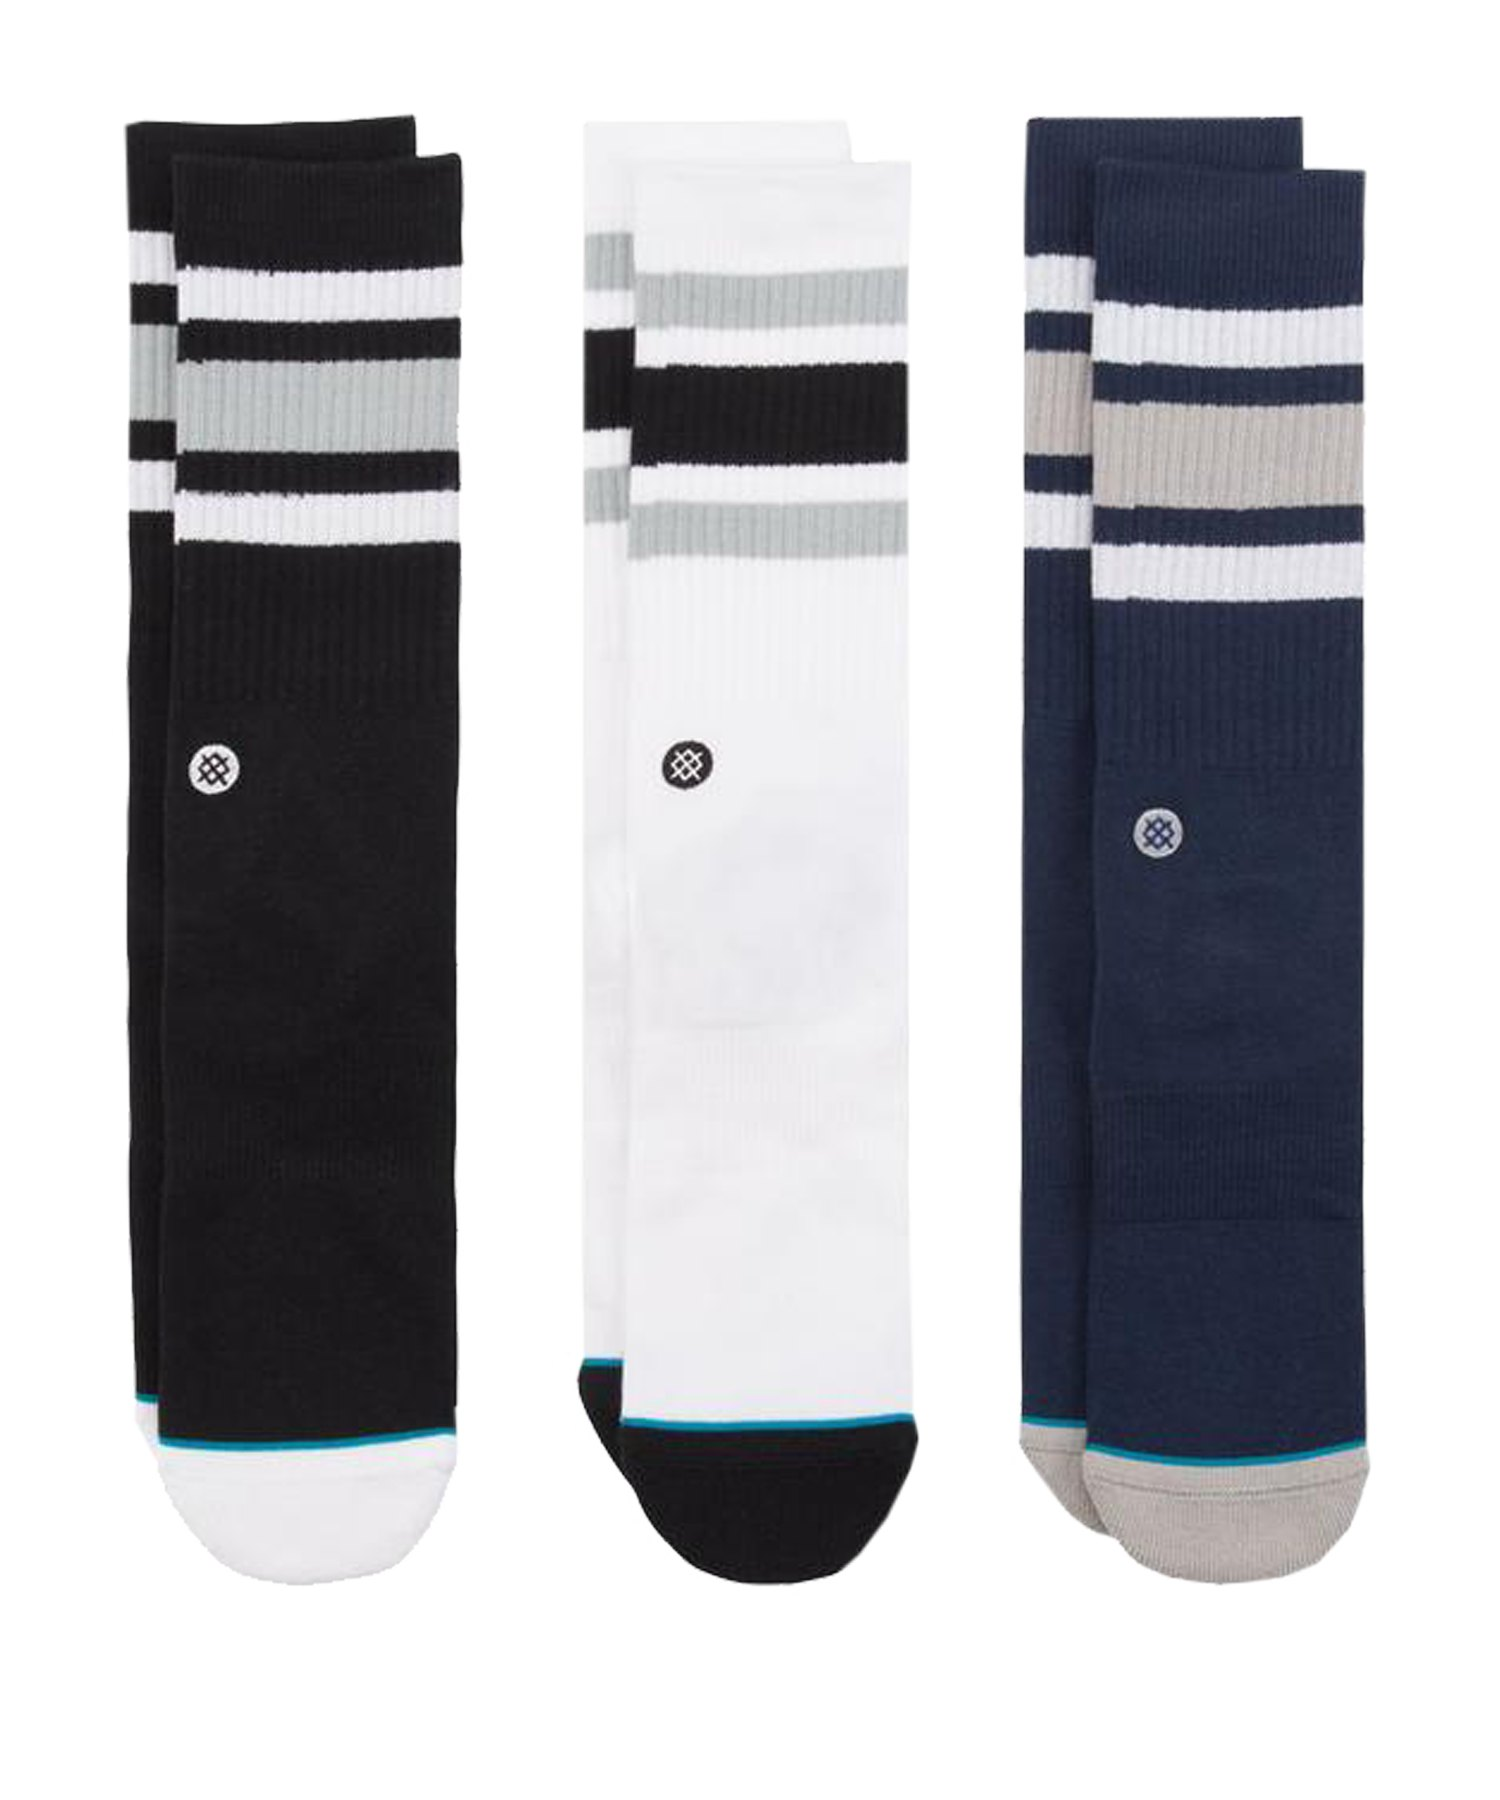 Stance Boyd 3er Pack Socken Multicolor - schwarz